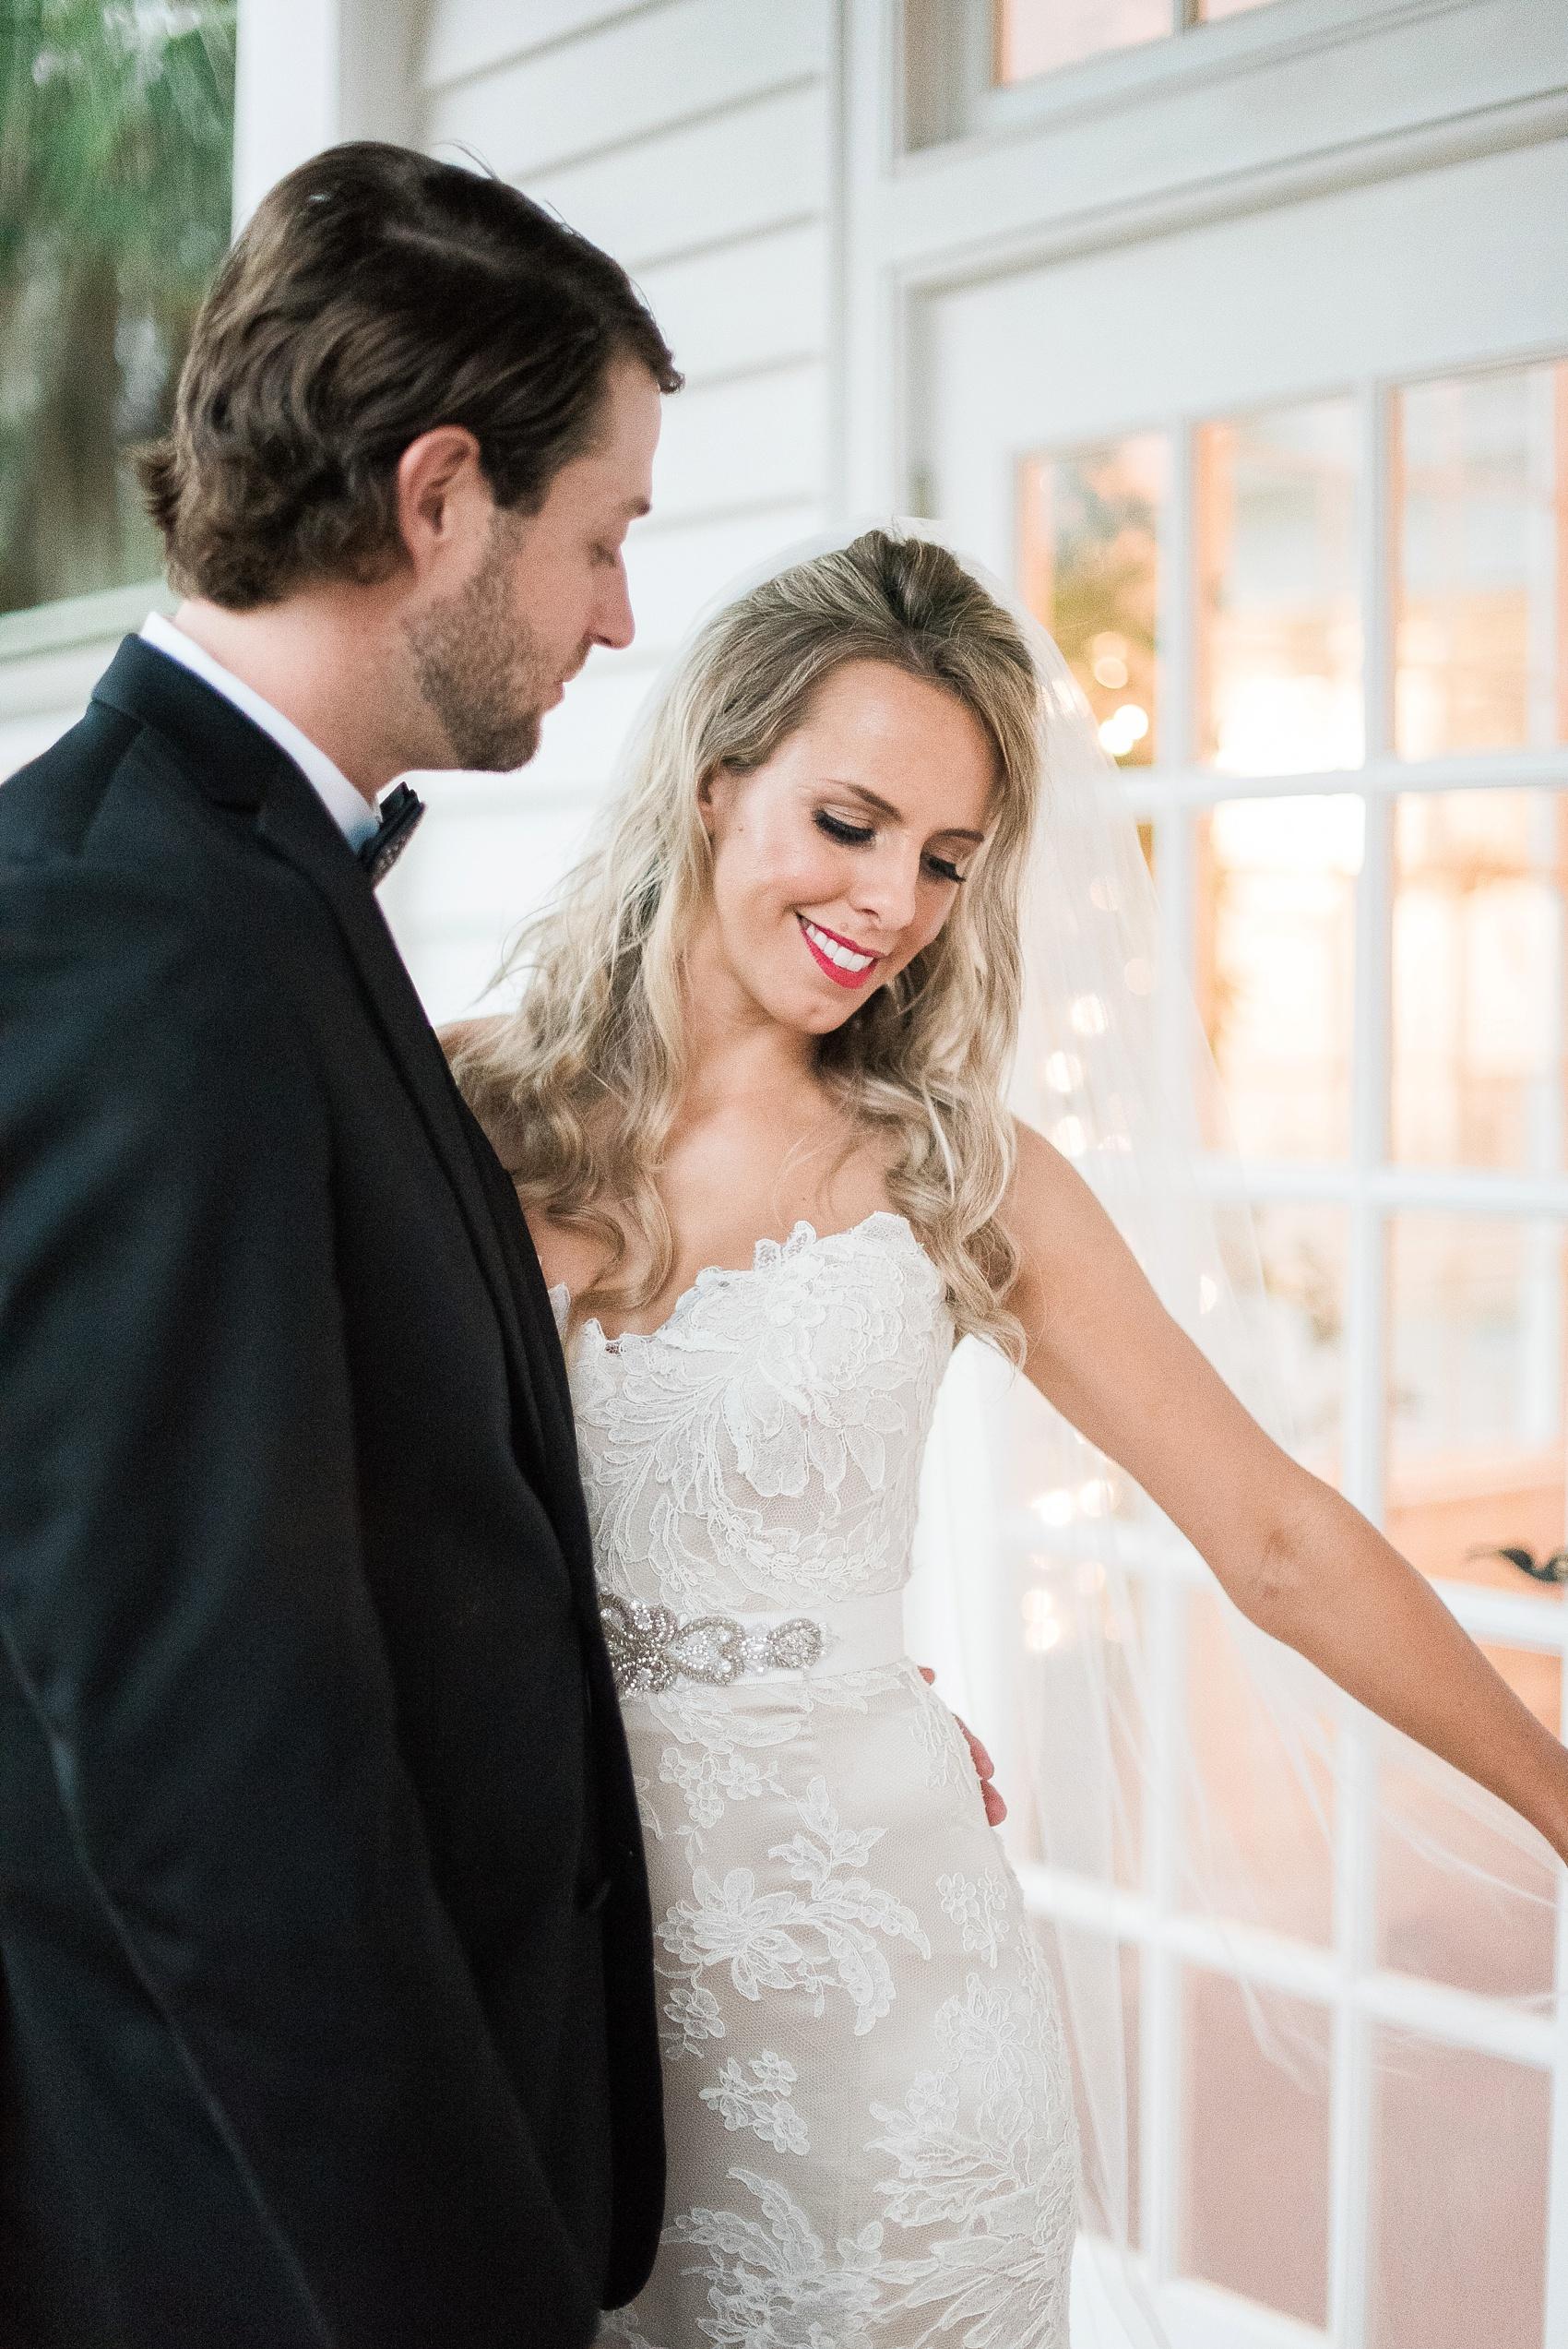 South_carolina_wedding_photographer_0056.jpg